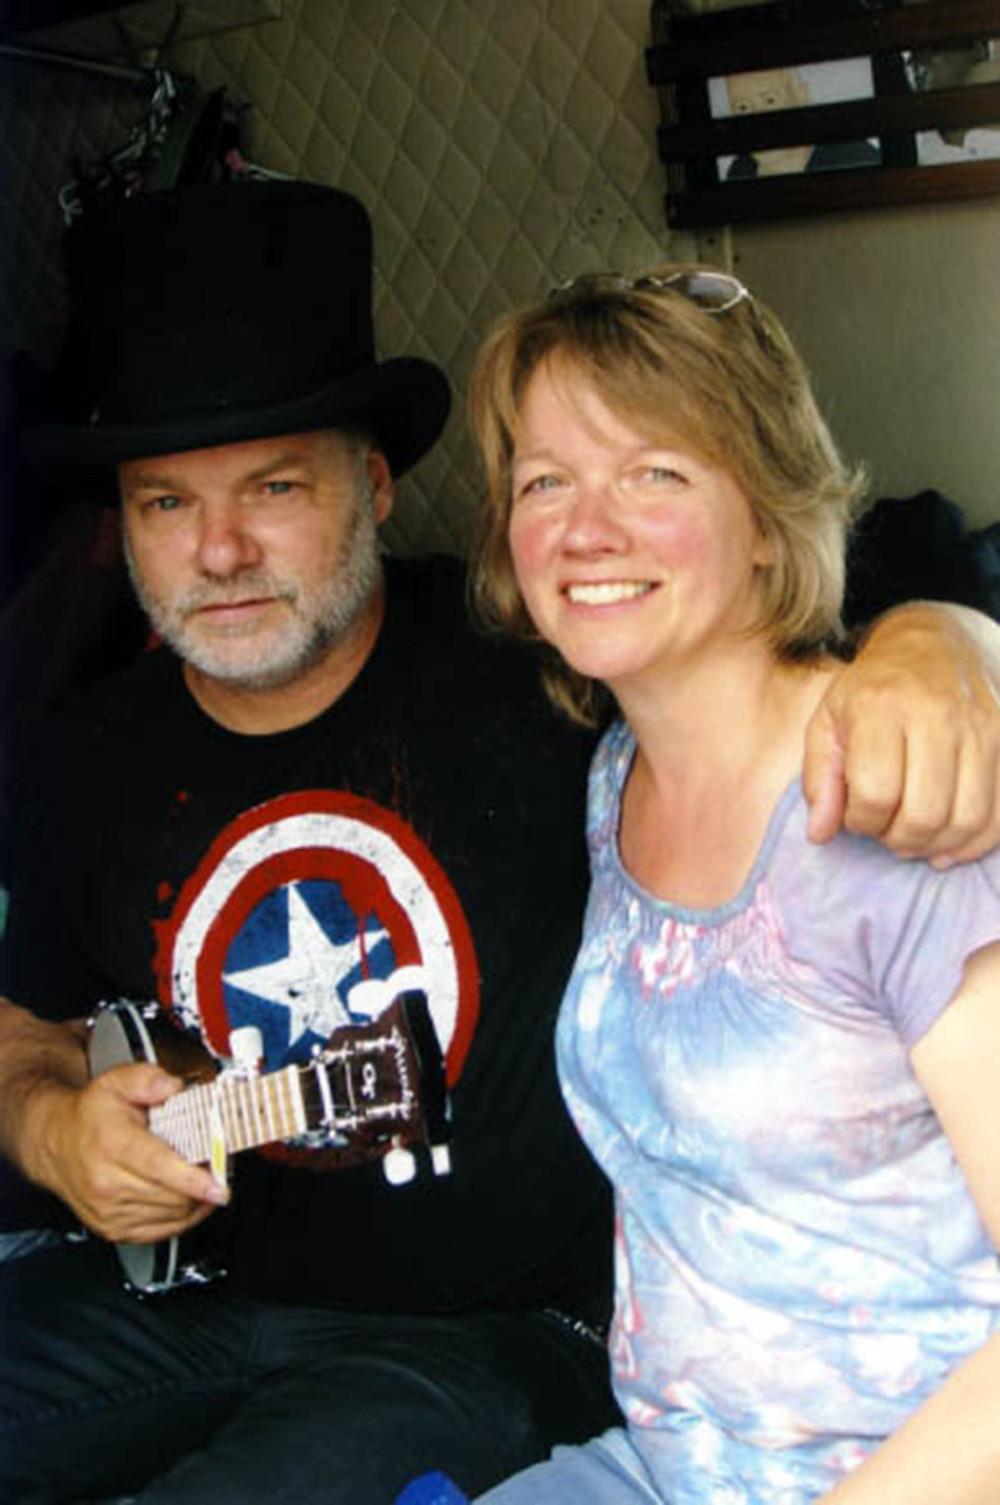 2010 - Fred Eaglesmith with Edmonton based recording artist Cathy Kowalski